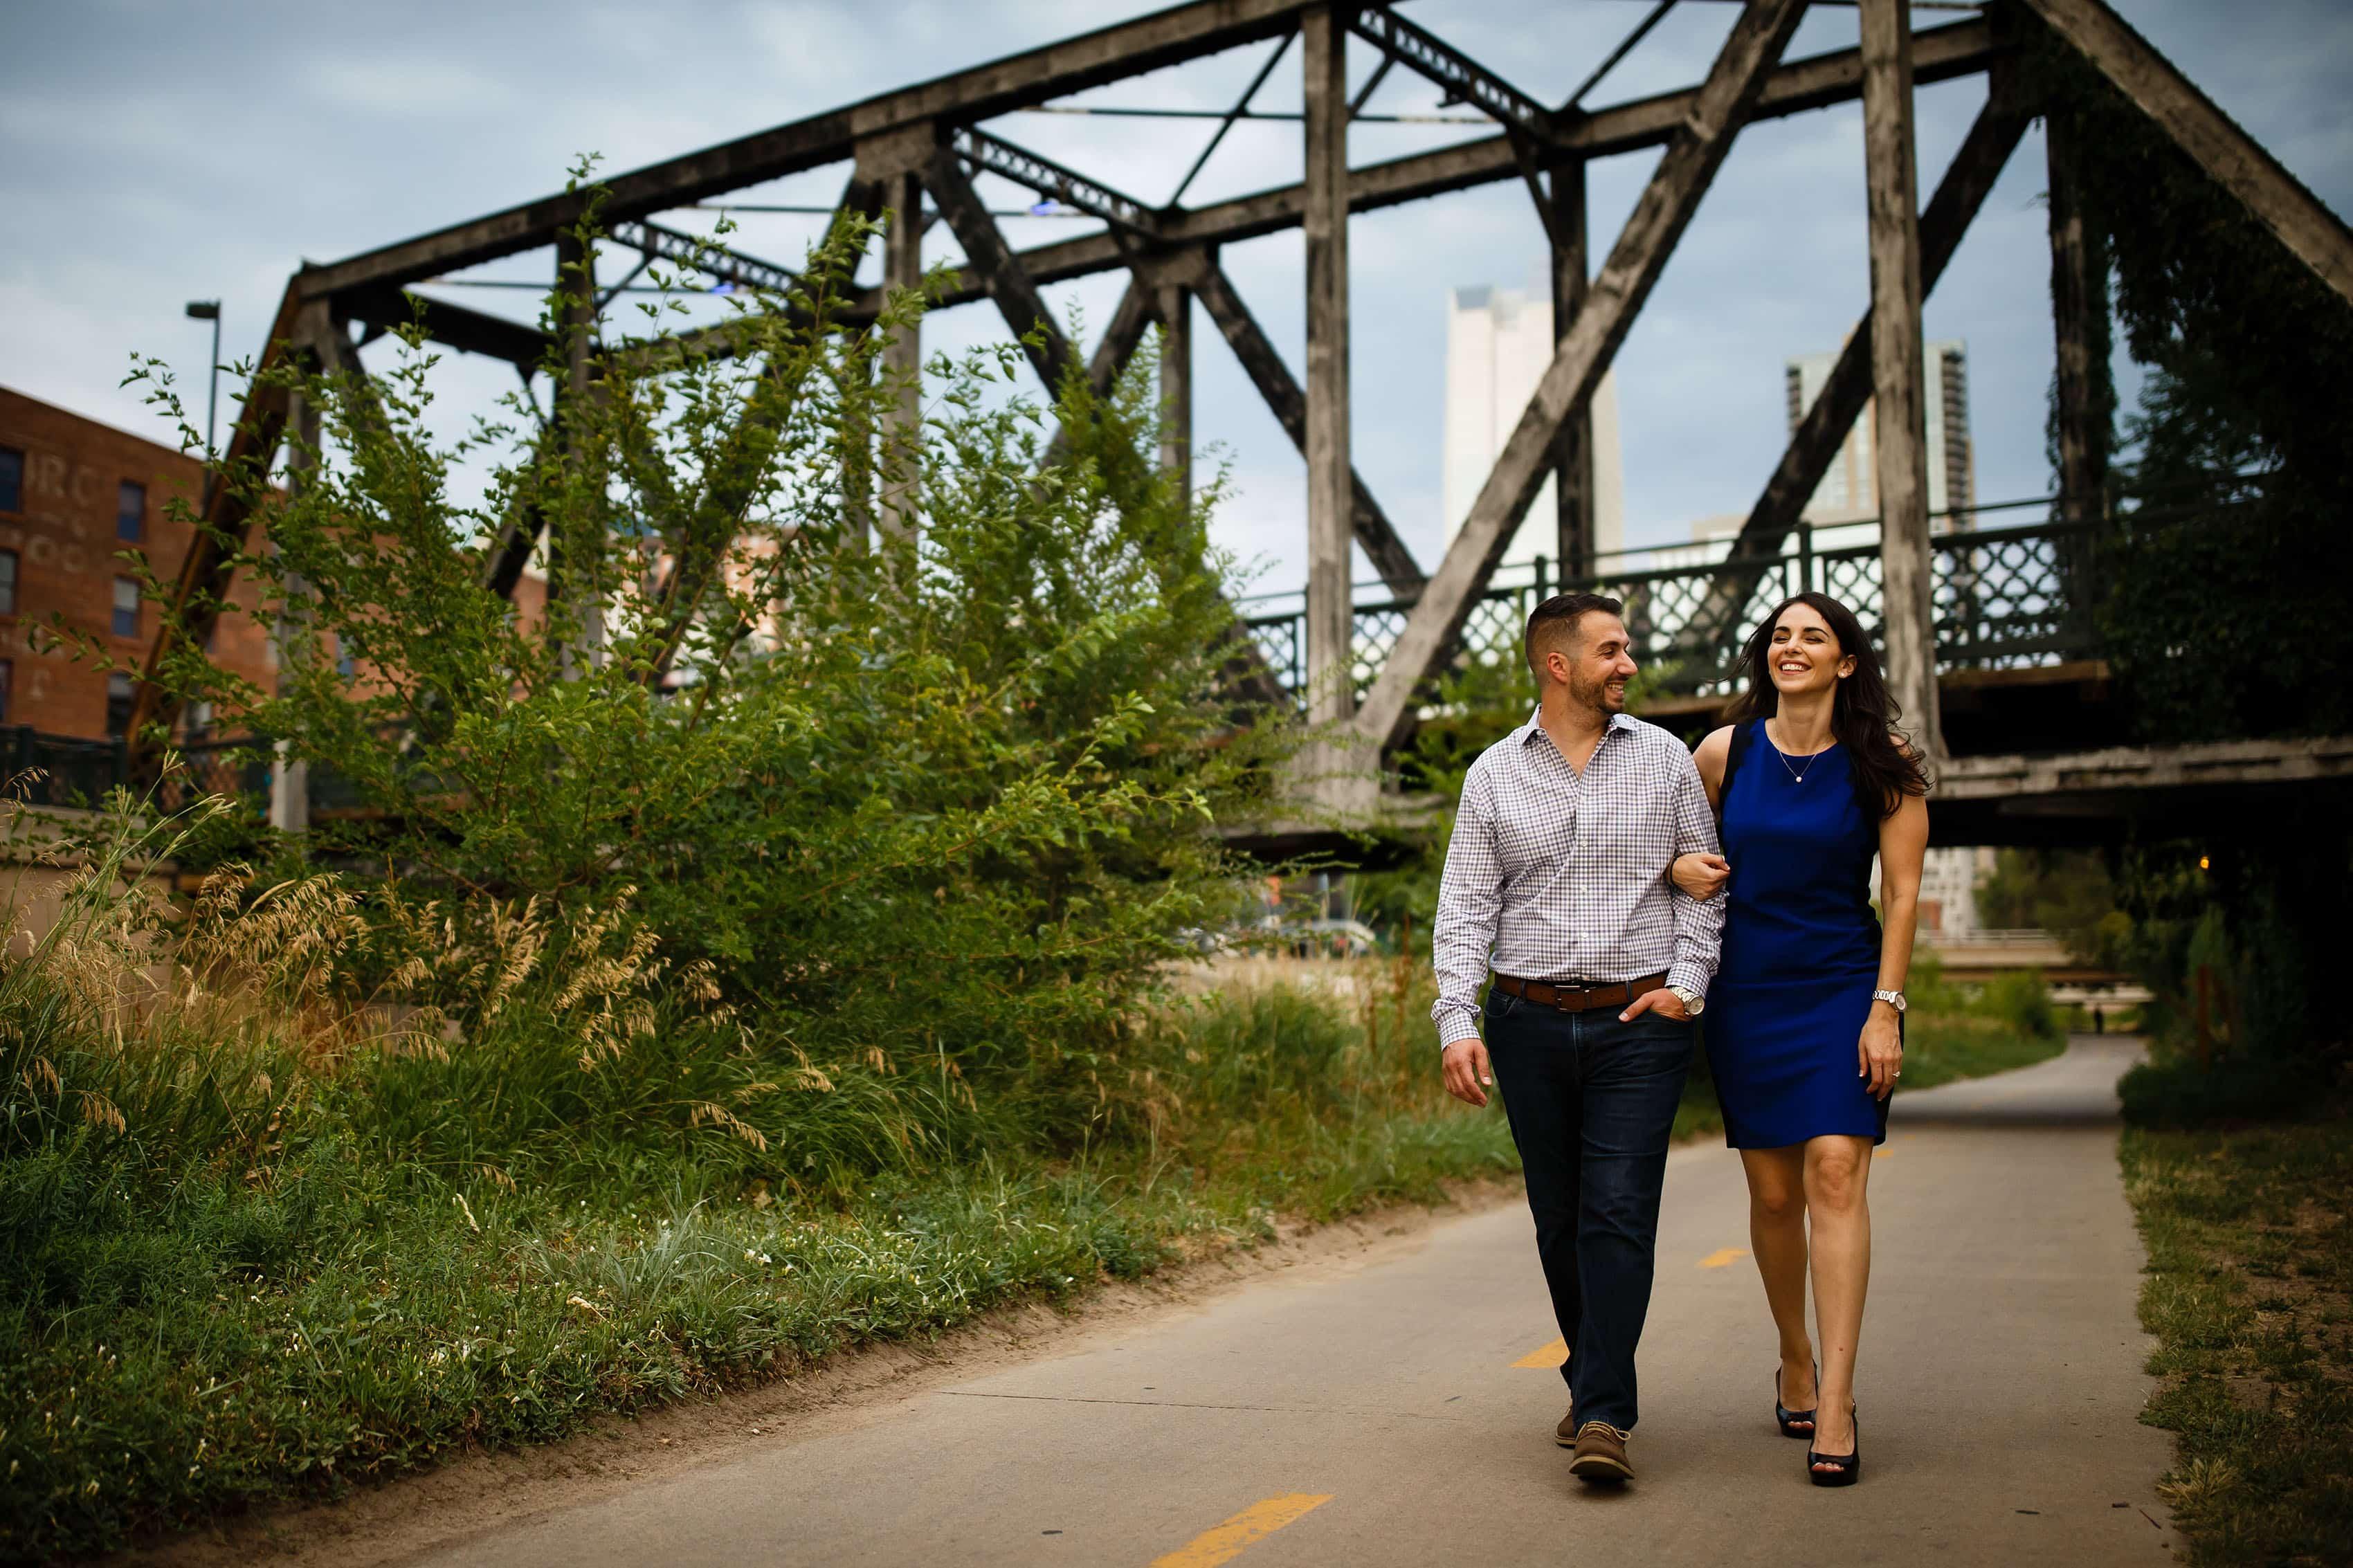 Couple walk and laugh on the Cherry Creek path near the Wynkoop Street Bridge in Denver